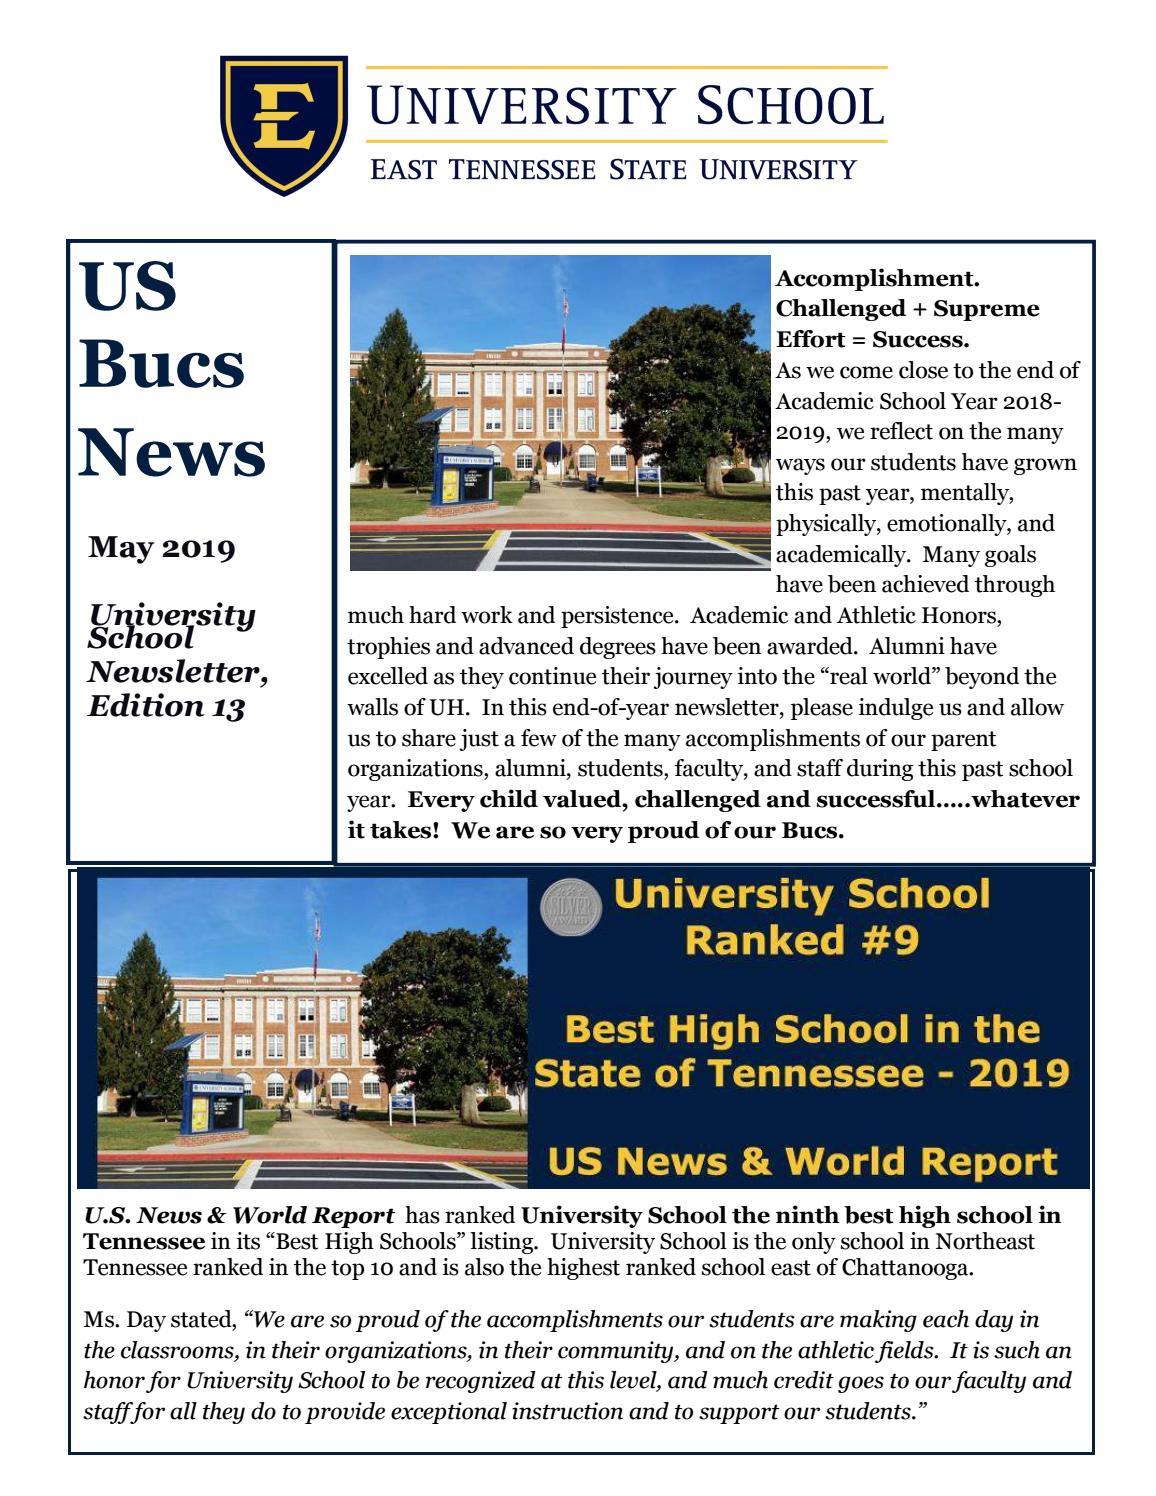 Acoustic Christmas 2019 Johnson City Tn.University School Alumni Newsletter May 2019 By East